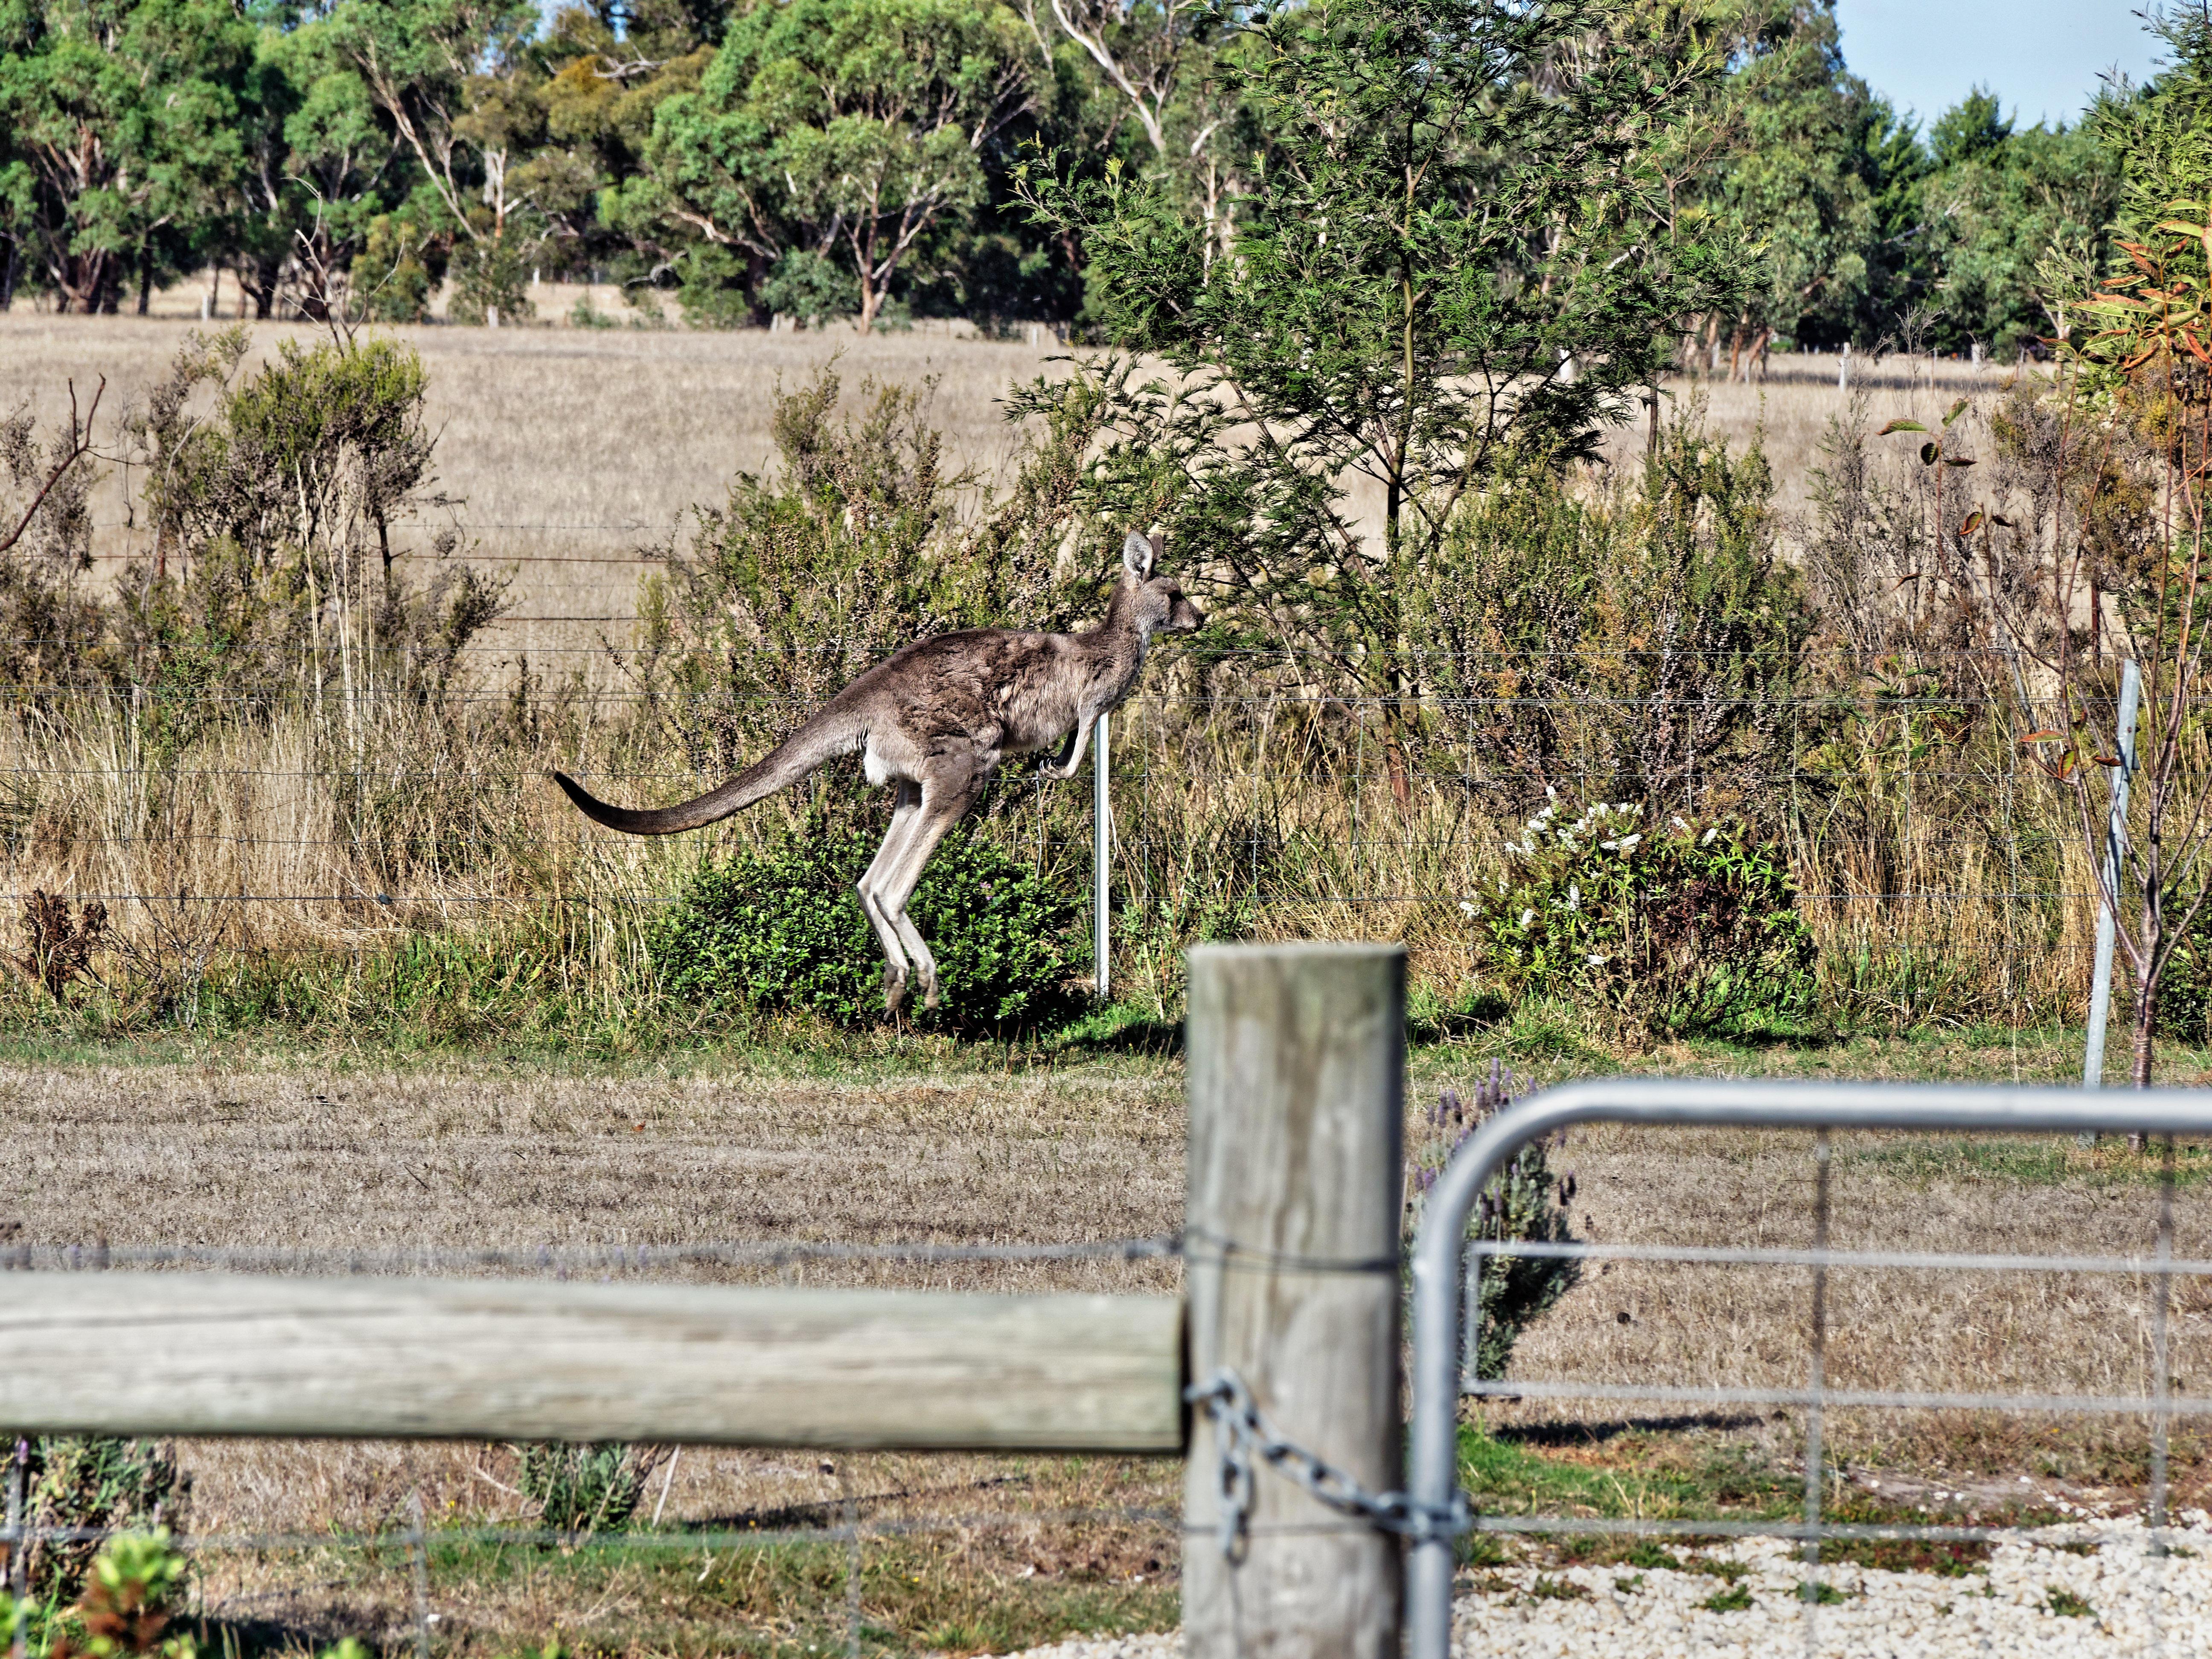 Kangaroo-11.jpeg